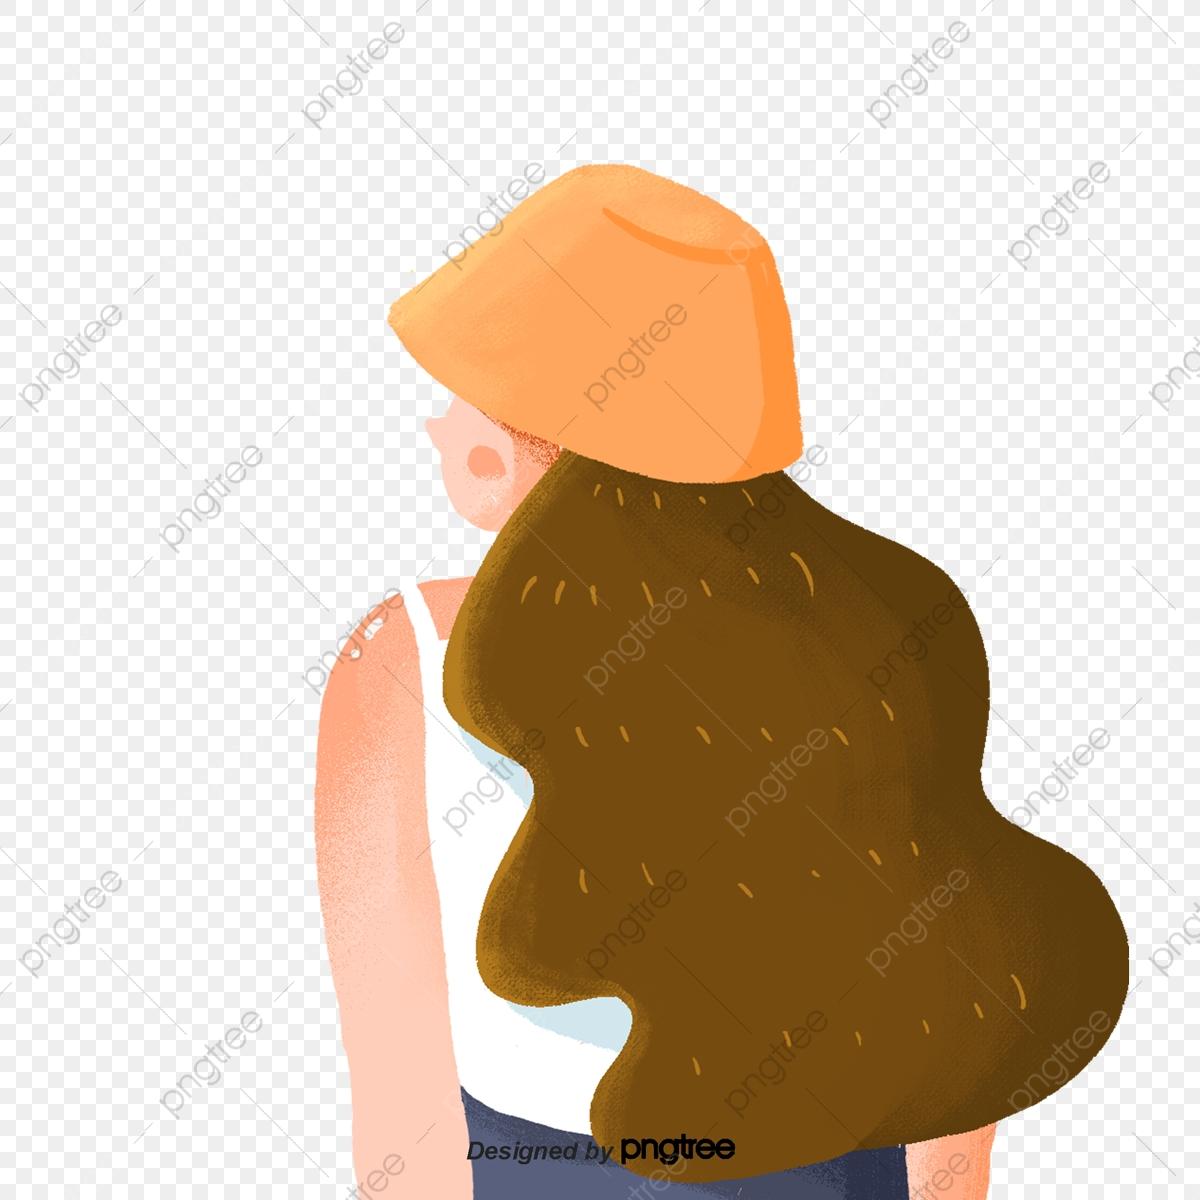 Dessin Animé Cheveux Longs Dos De Fille Carton Dos été